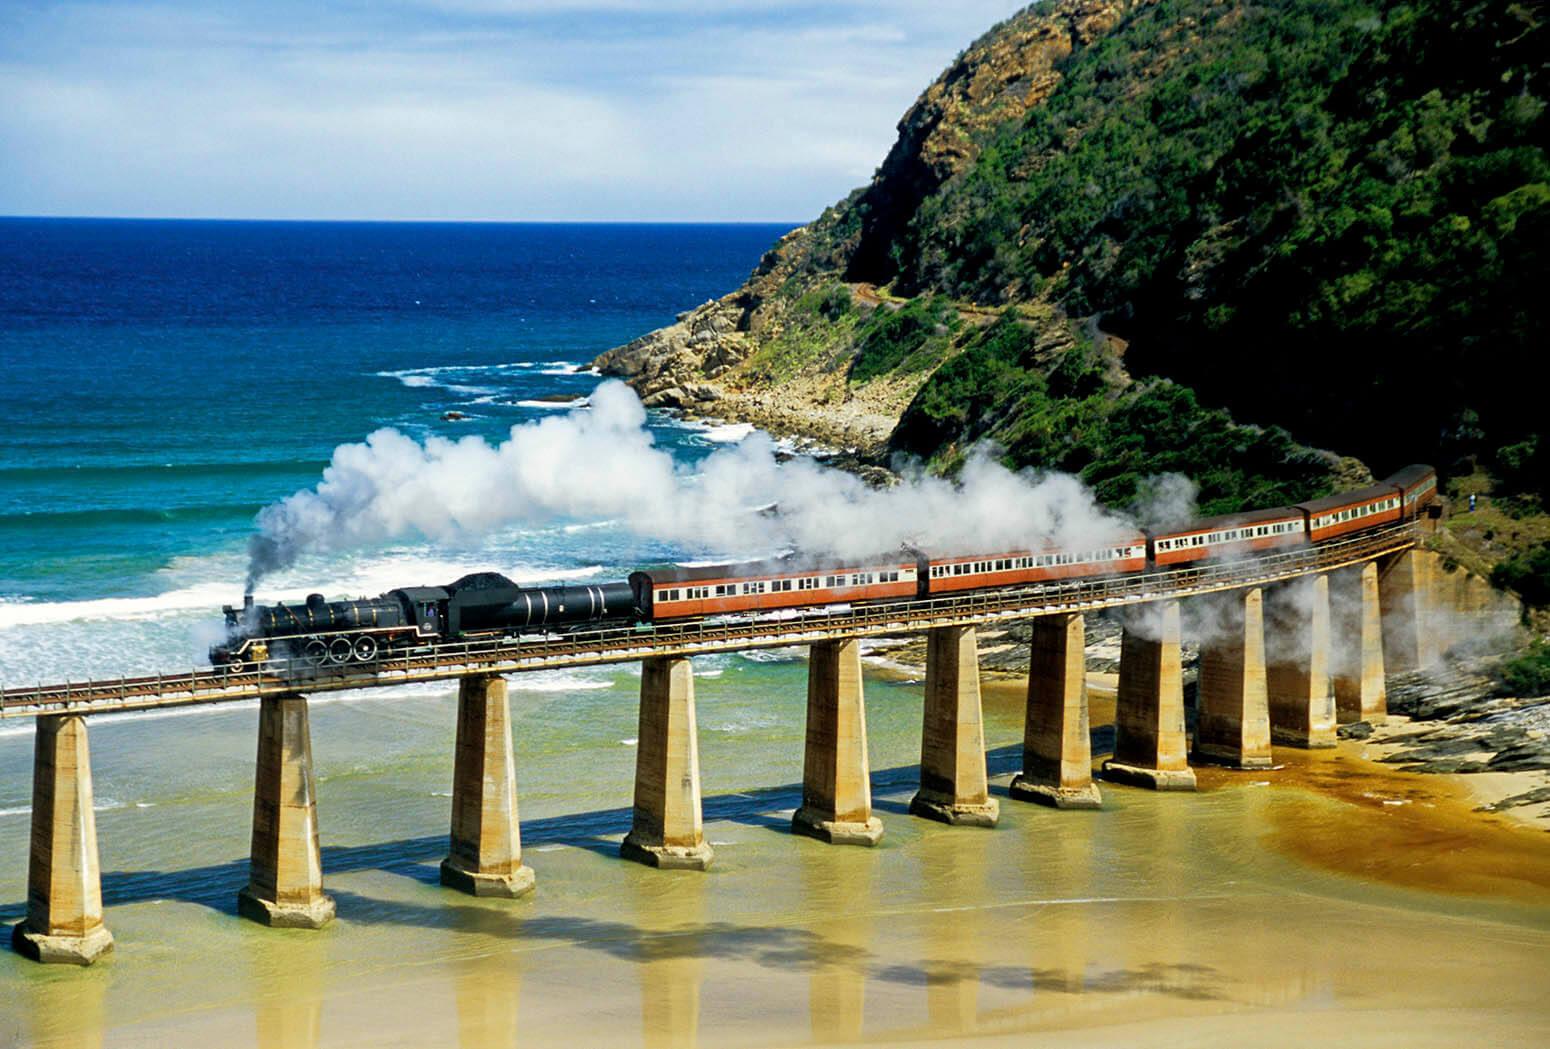 south-africas-outenigue-choo-tjoe-train